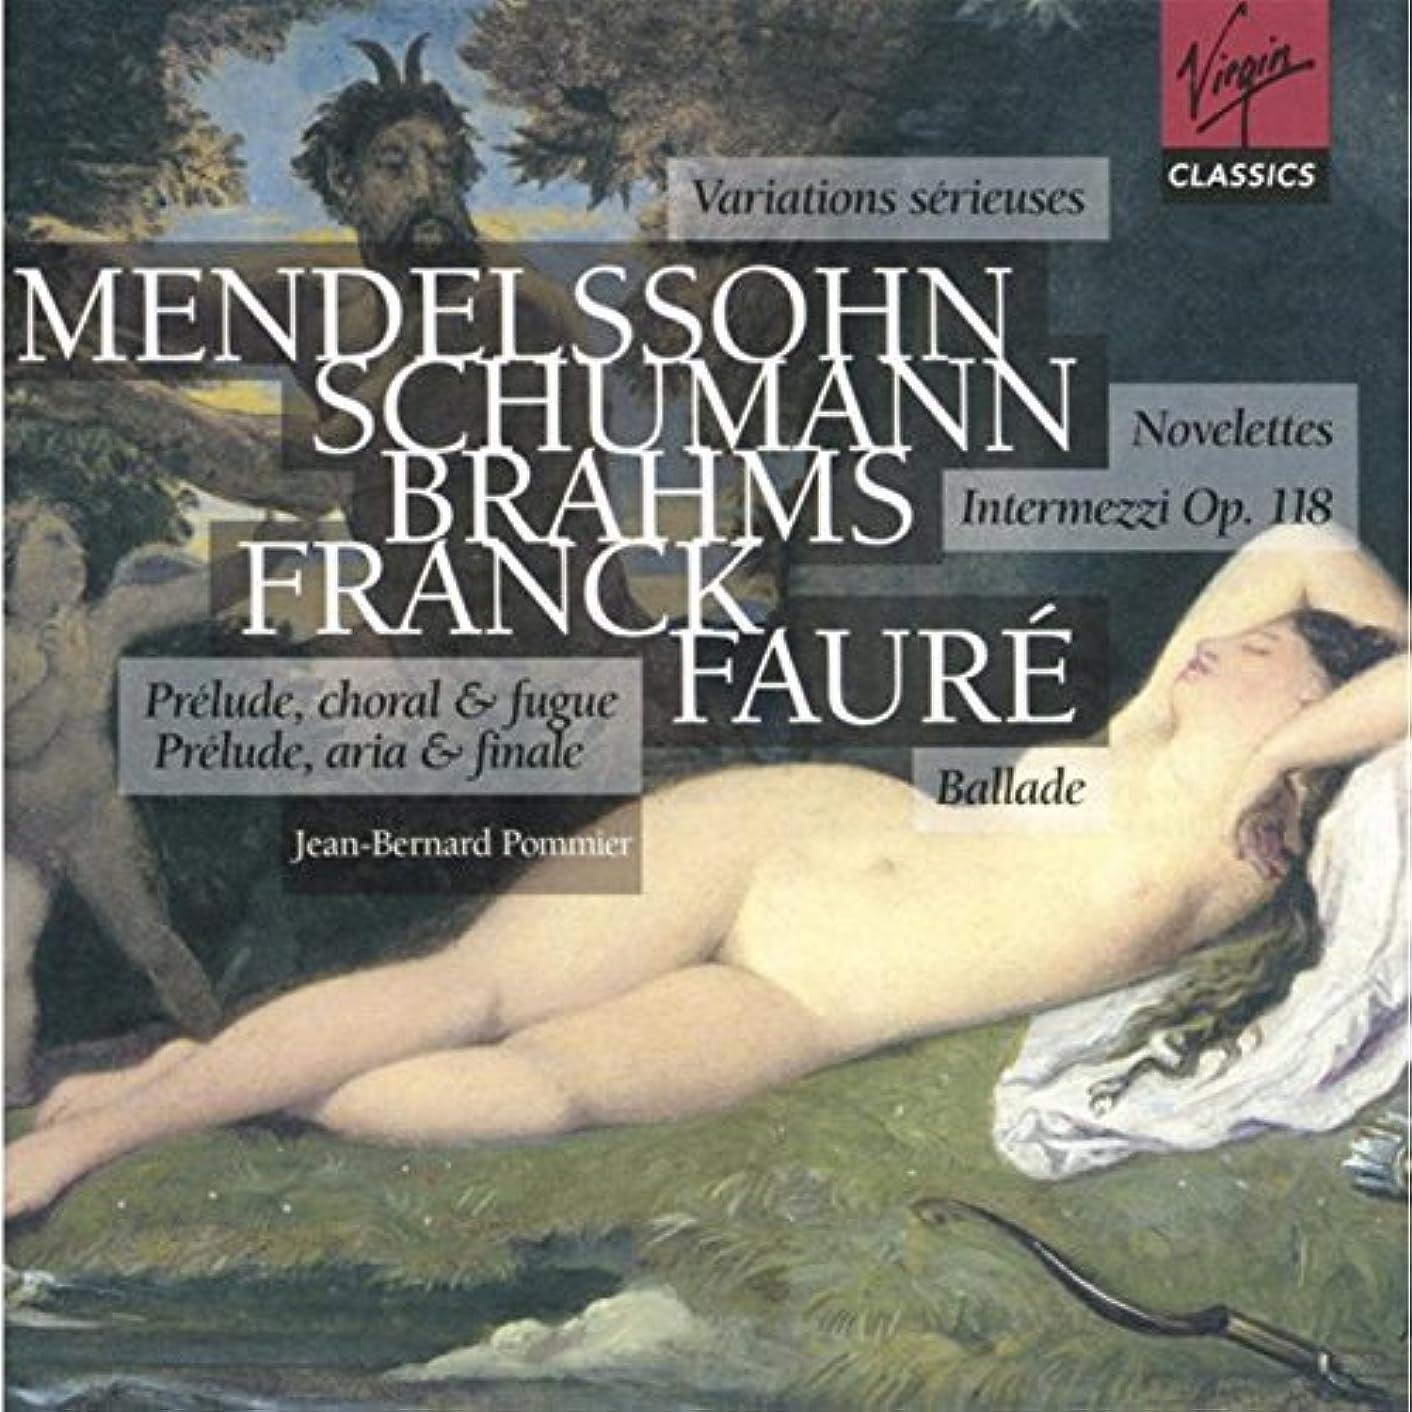 Variations Serieuses/Novelettes/Three Intermezzi (Pommier) by Mendelssohn/Schumann/Brahms (2005-12-31)